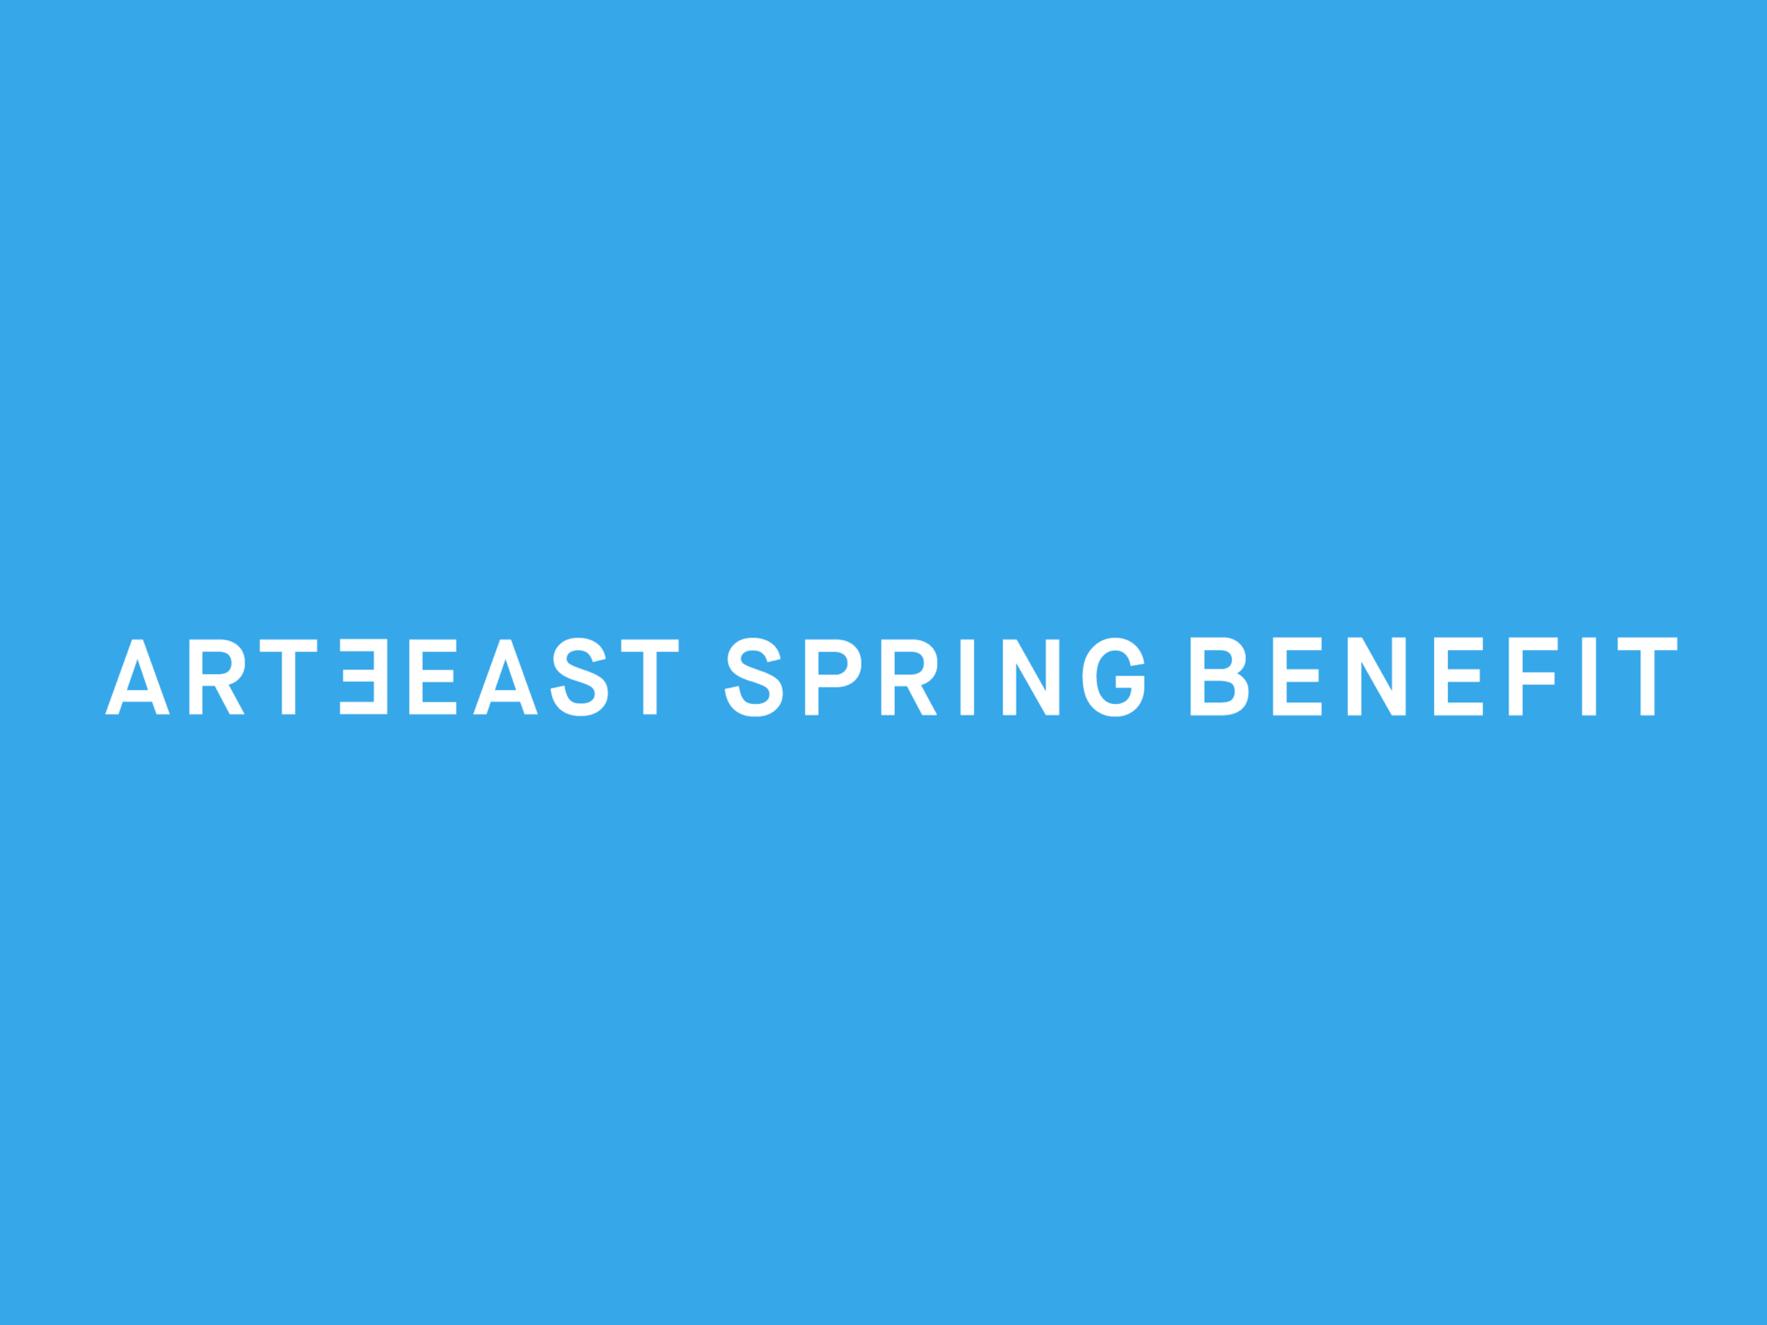 ArteEast Spring Benefit 2019 image